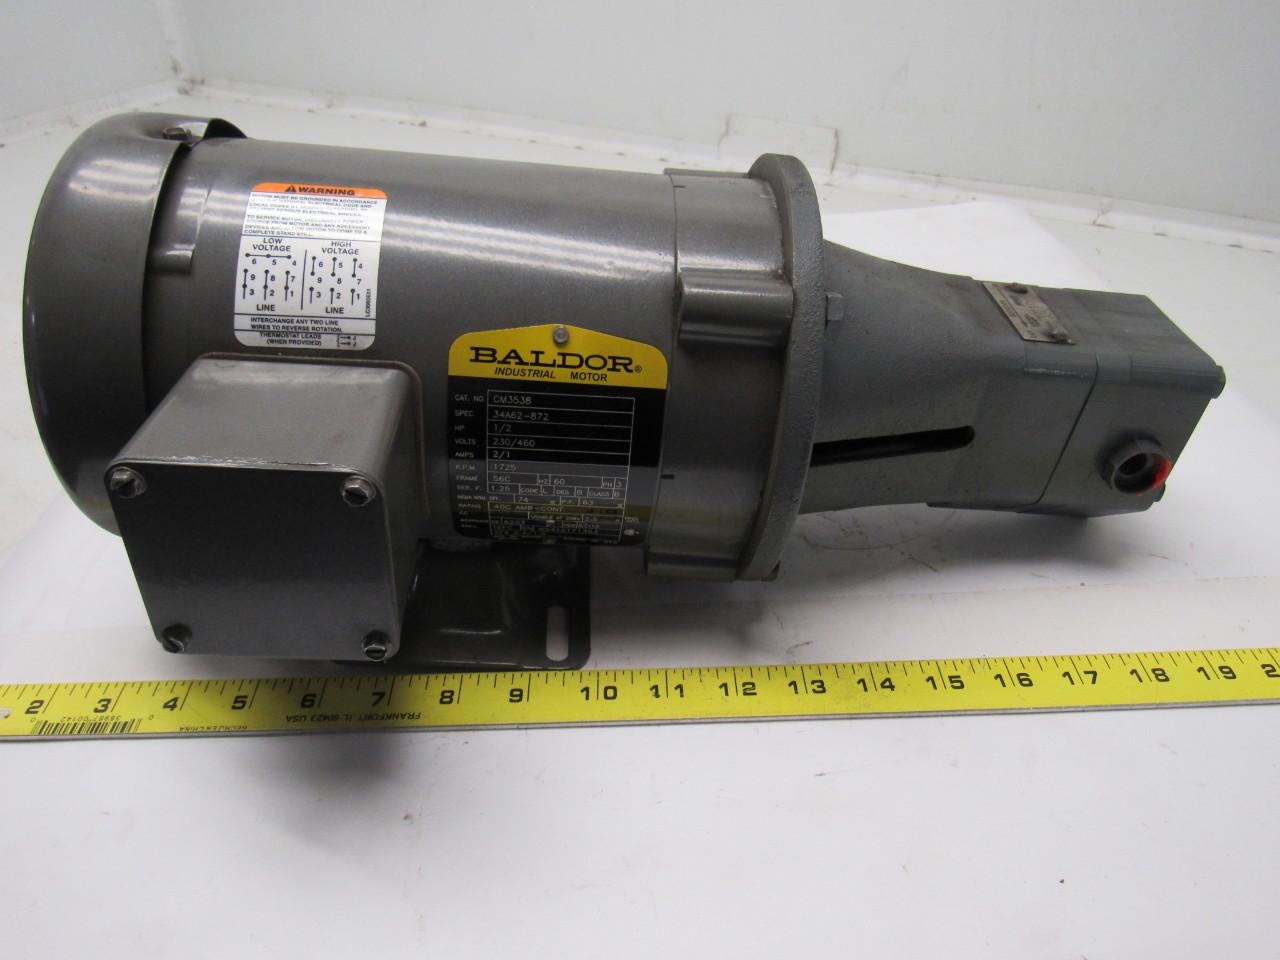 Baldor viking vm3538 7r948c1 hydraulic pump 1 2 hp for Baldor 2 hp single phase motor